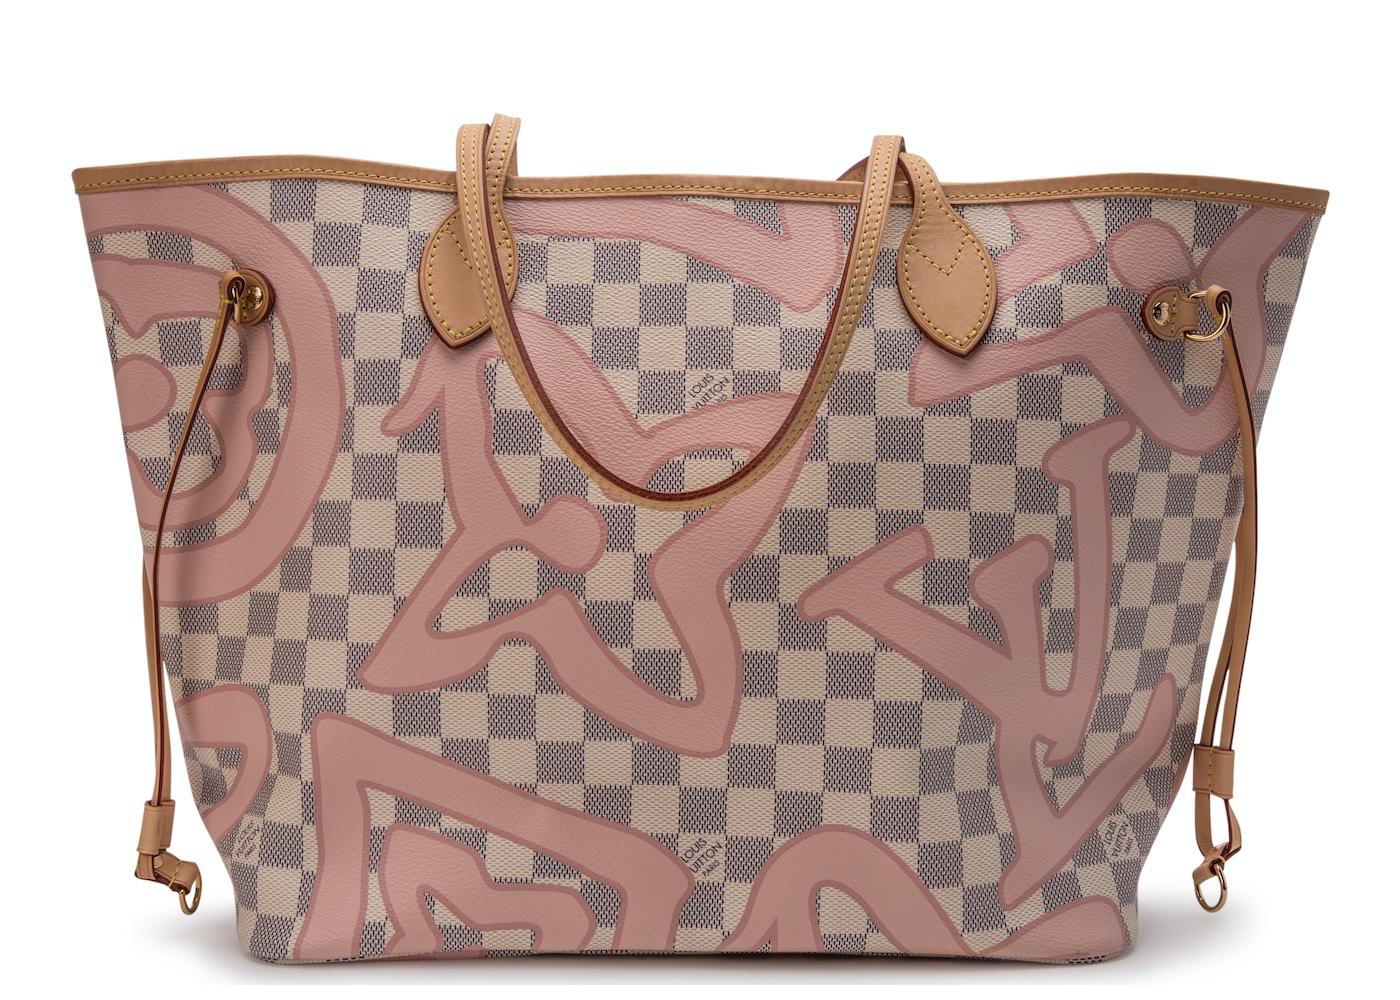 7c9403d6152 Louis Vuitton Neverfull Damier Azur Tahitienne (Without Pouch) MM ...